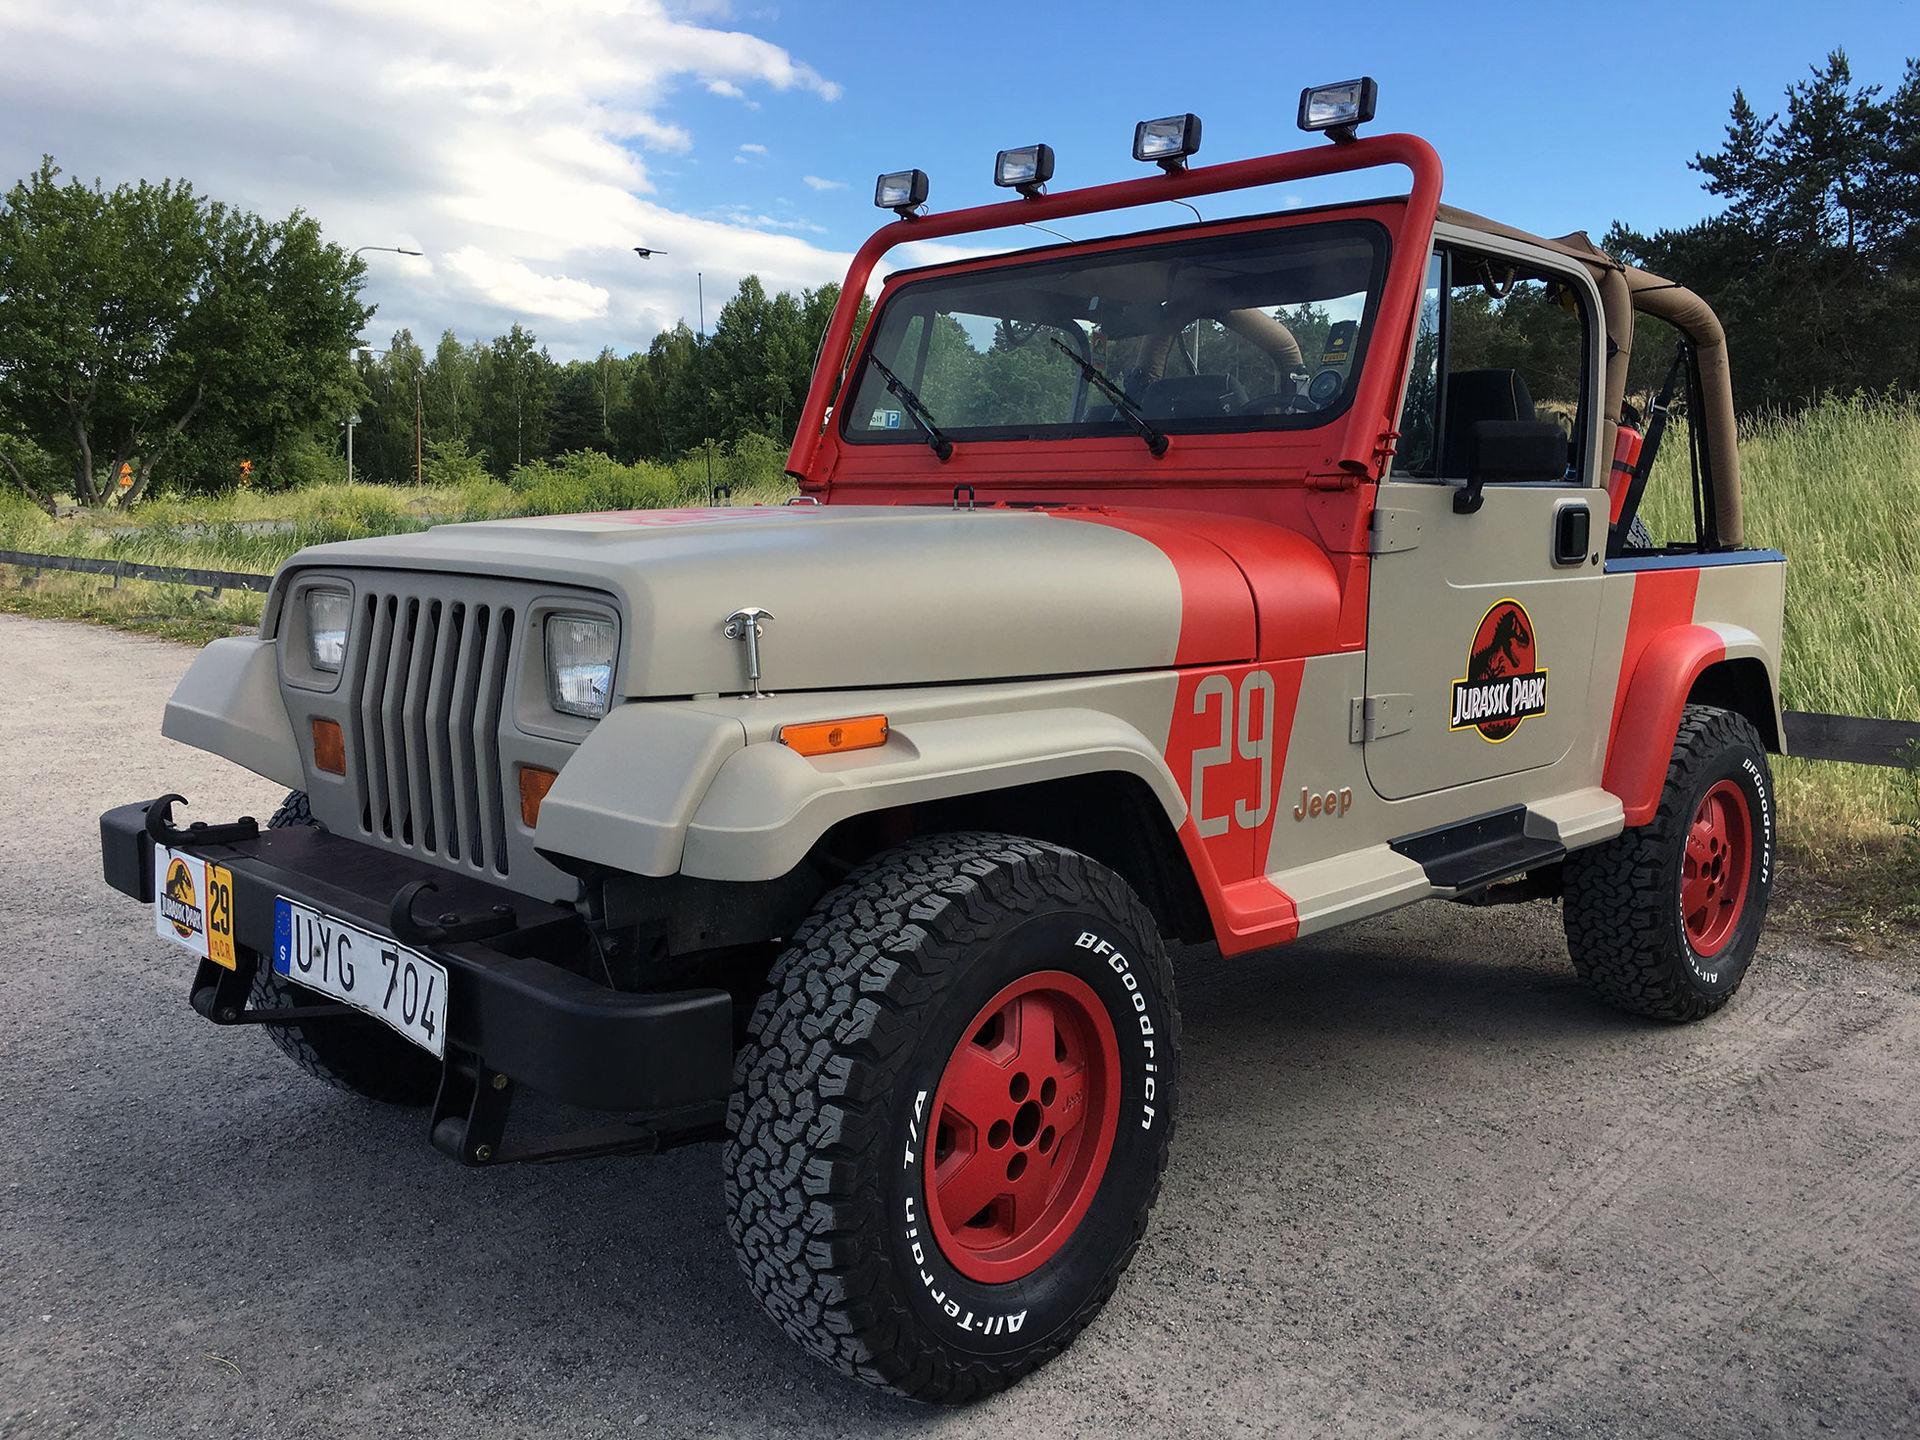 Zacke har fixat sin egen Jurassic-Jeep